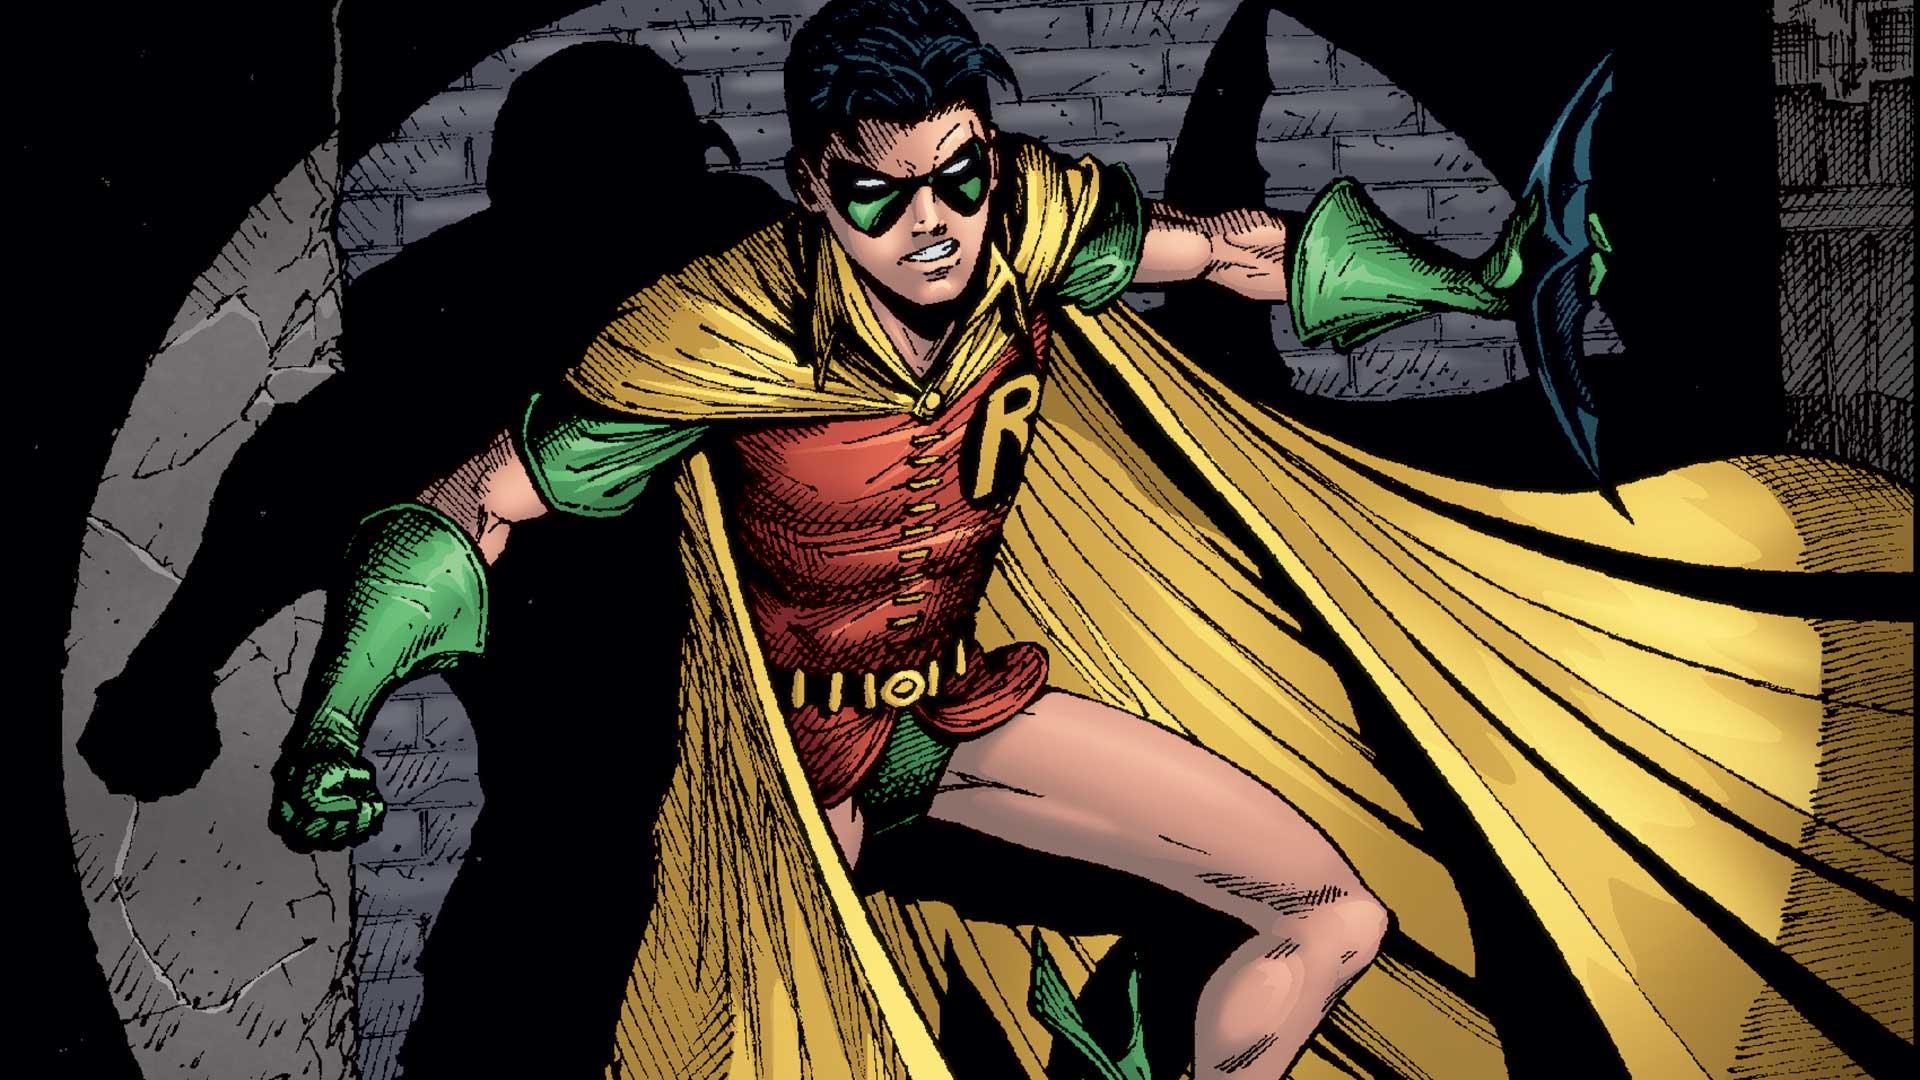 Drawn robin comic book superhero 101: DC Heroes One